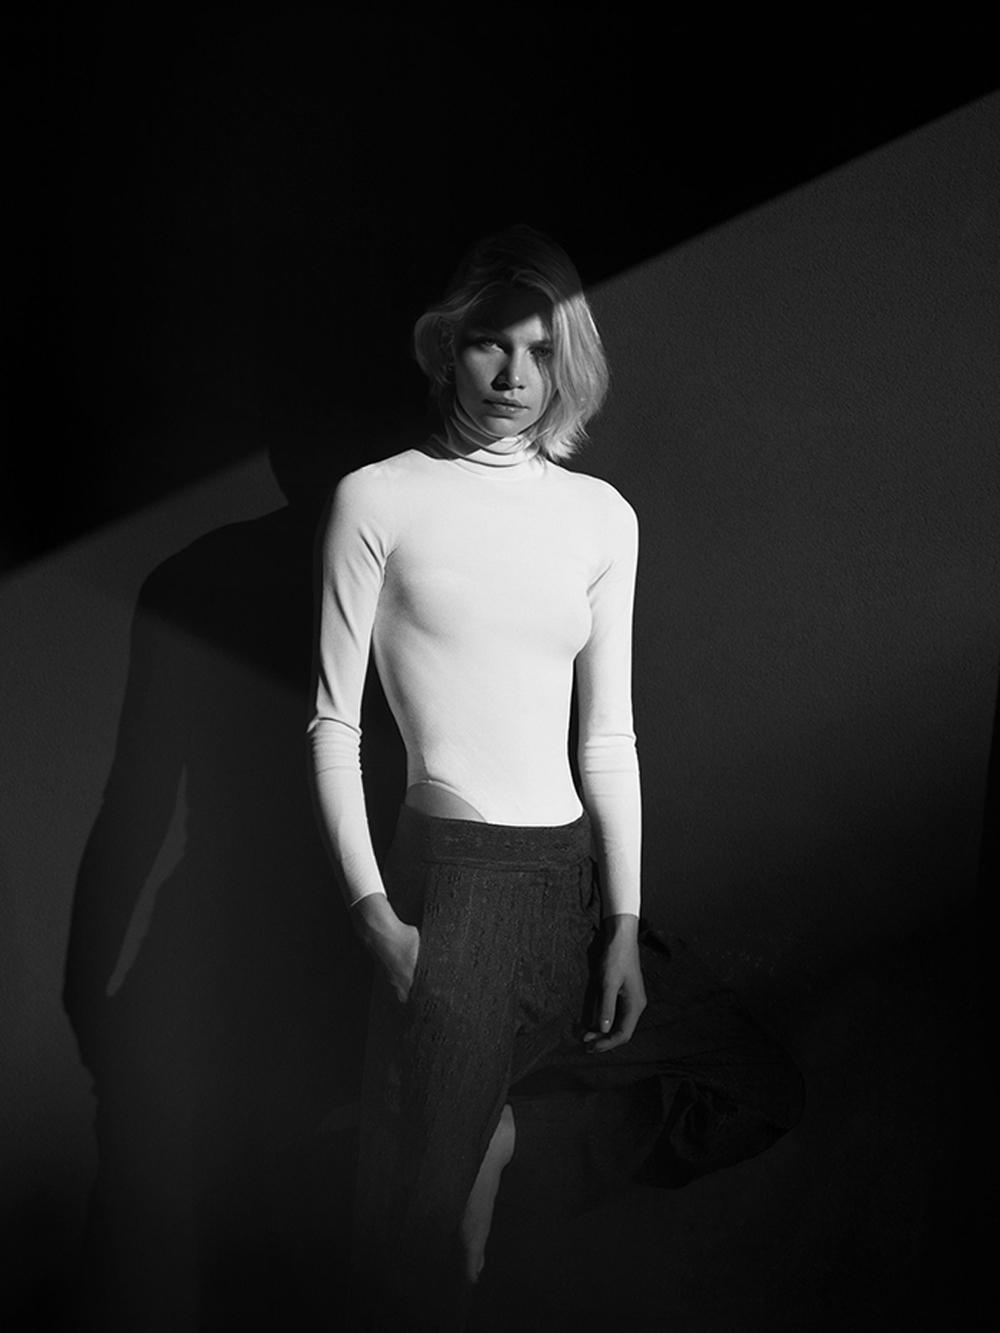 Aline-Weber-by-Annemarieke-van-Drimmelen-for-Rika-Magazine-1.jpg